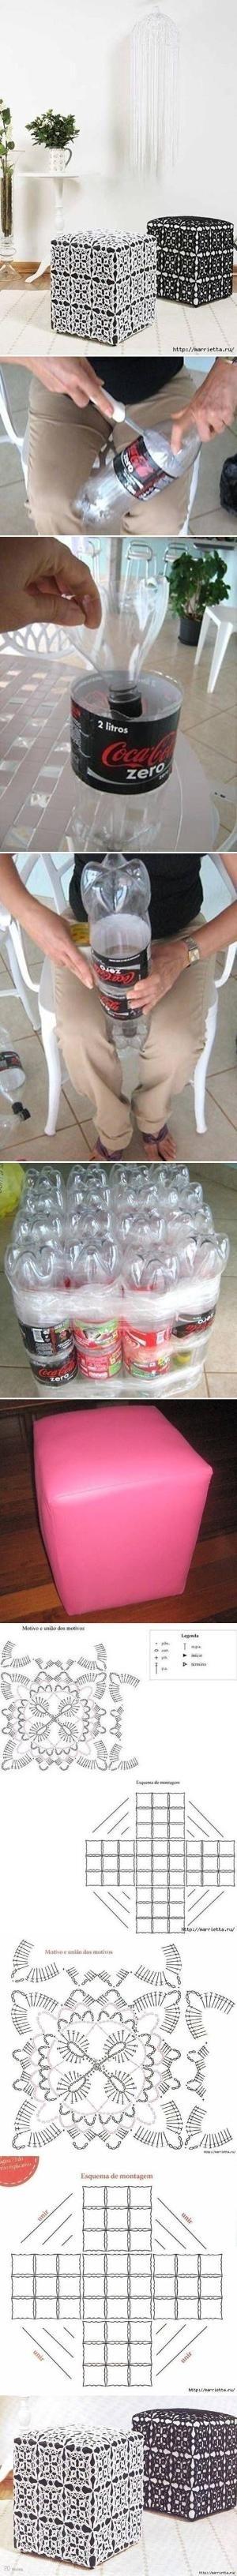 DIY Ottoman Out of Plastic Bottles DIY Ottoman Out of Plastic Bottles by cornelia